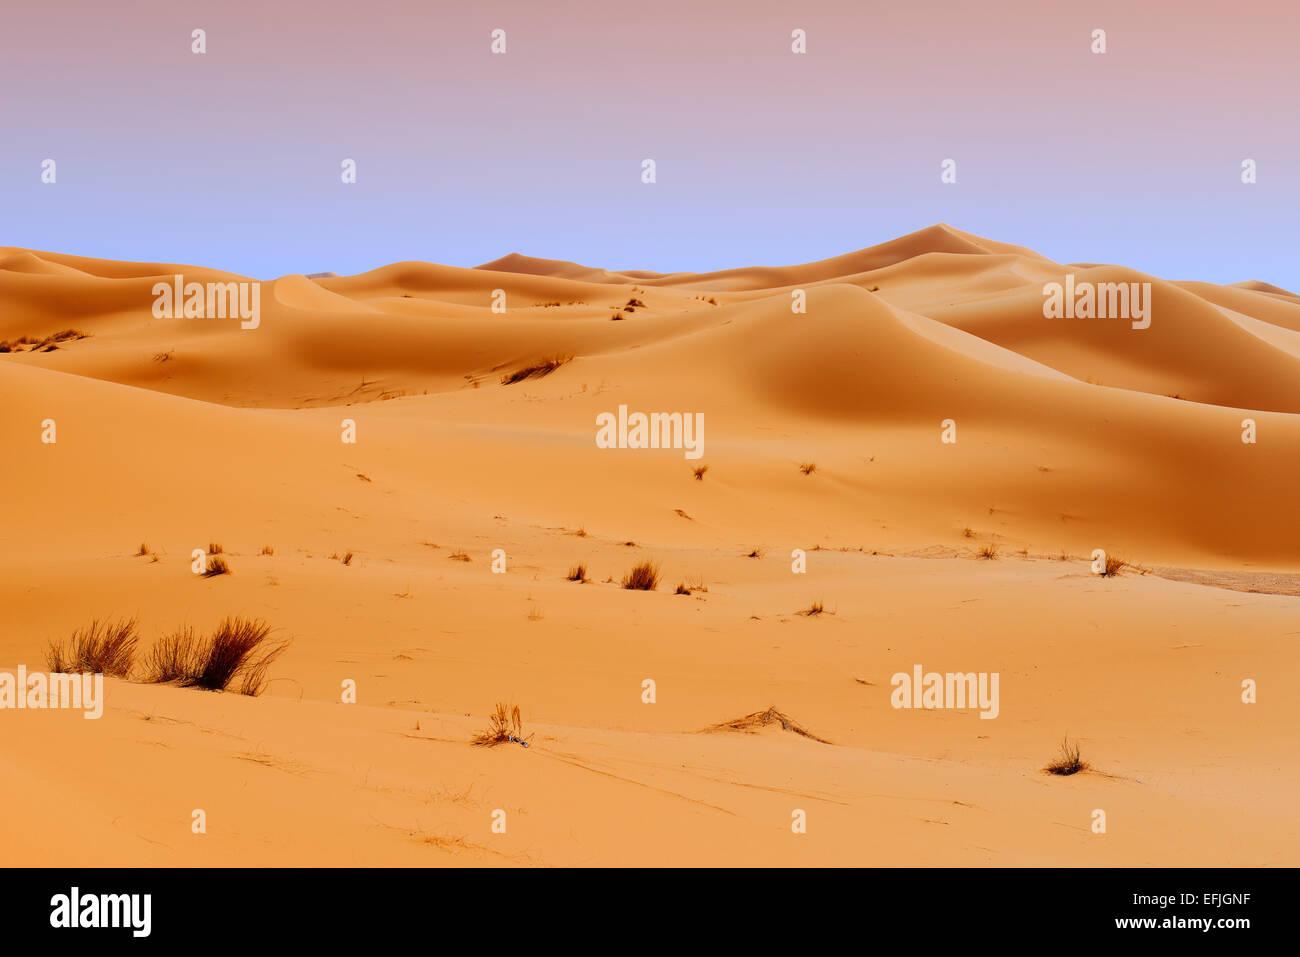 Merzouga, Erg Chebbi, Merzouga sand dunes, Sahara Desert, Morocco, Maghreb, North Africa - Stock Image